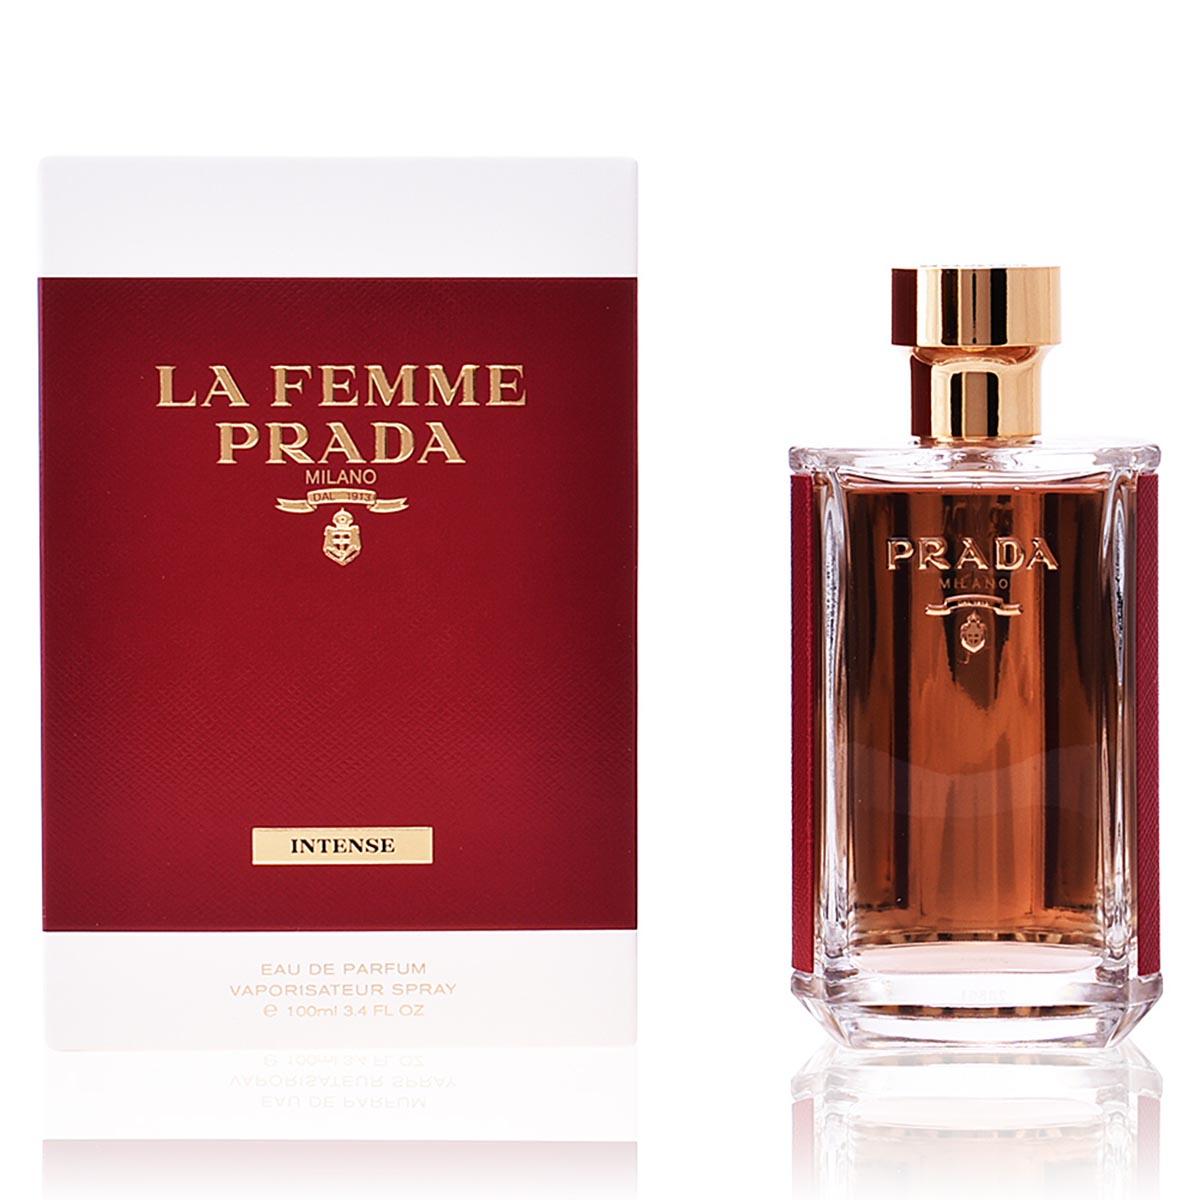 Prada femme intense eau de parfum 100ml vaporizador